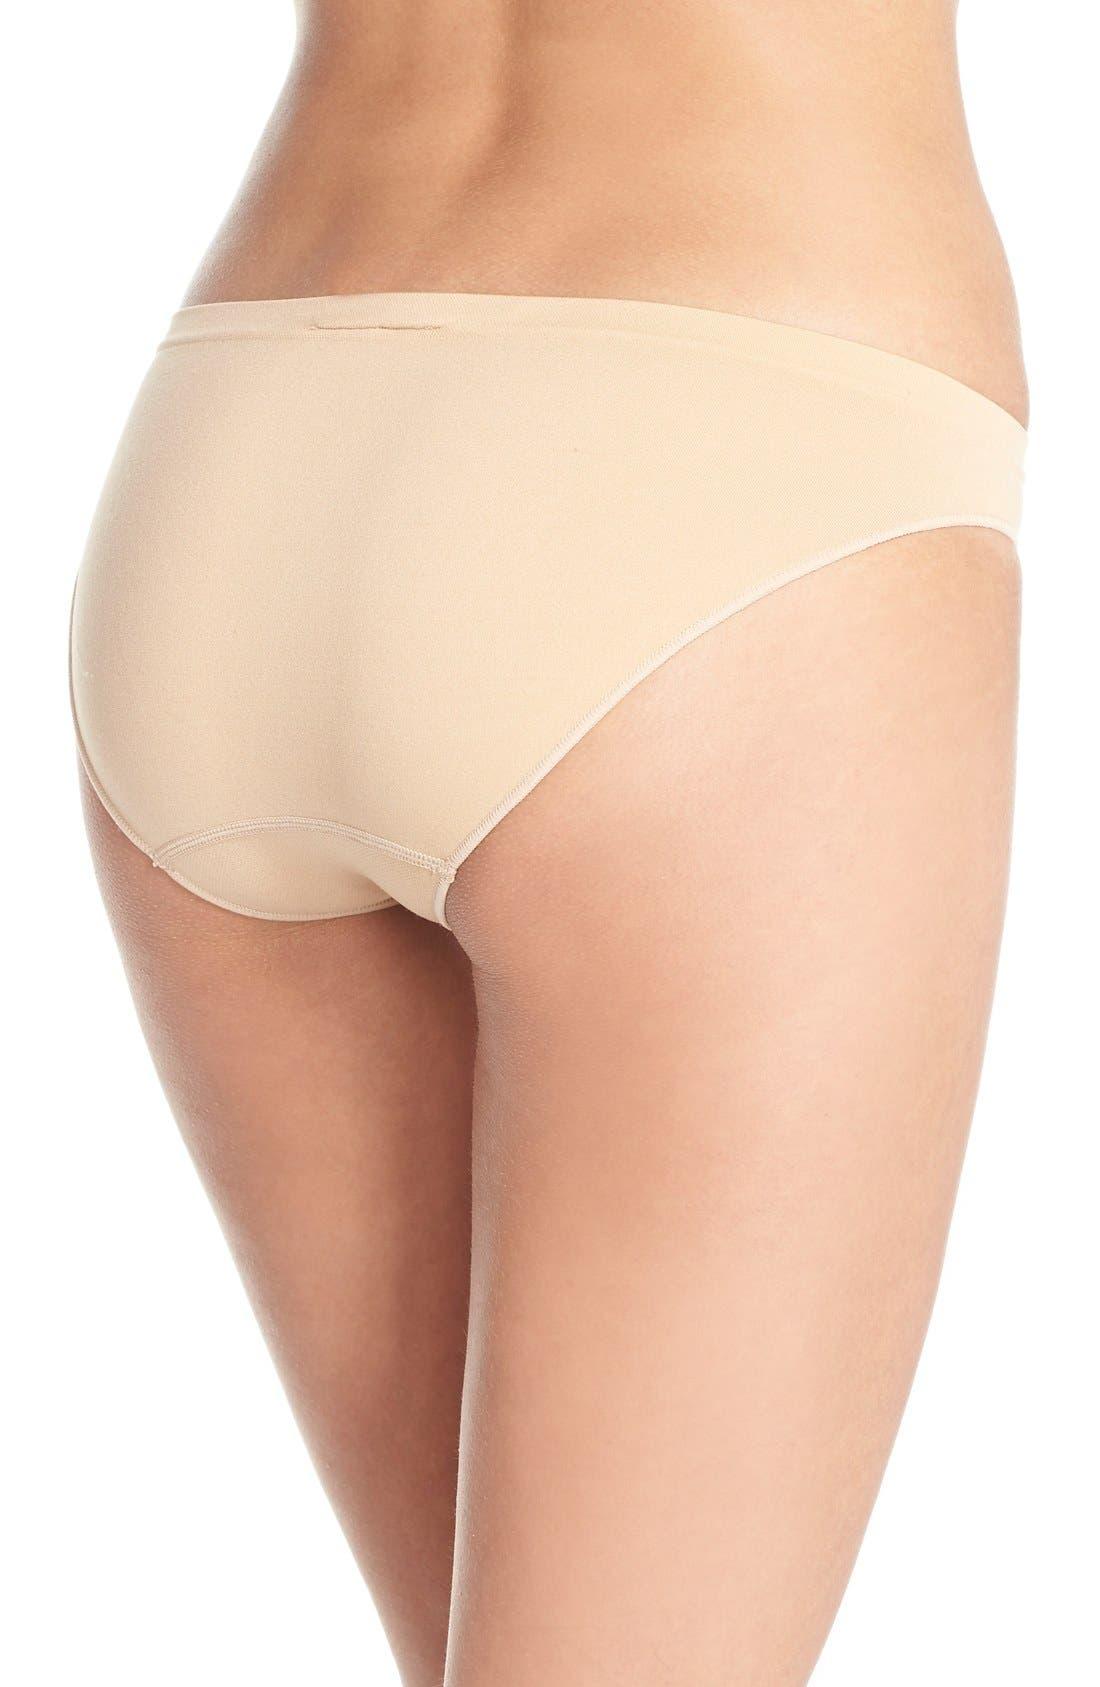 Alternate Image 2  - Calvin Klein 'Pure' Seamless Bikini (3 for $33)